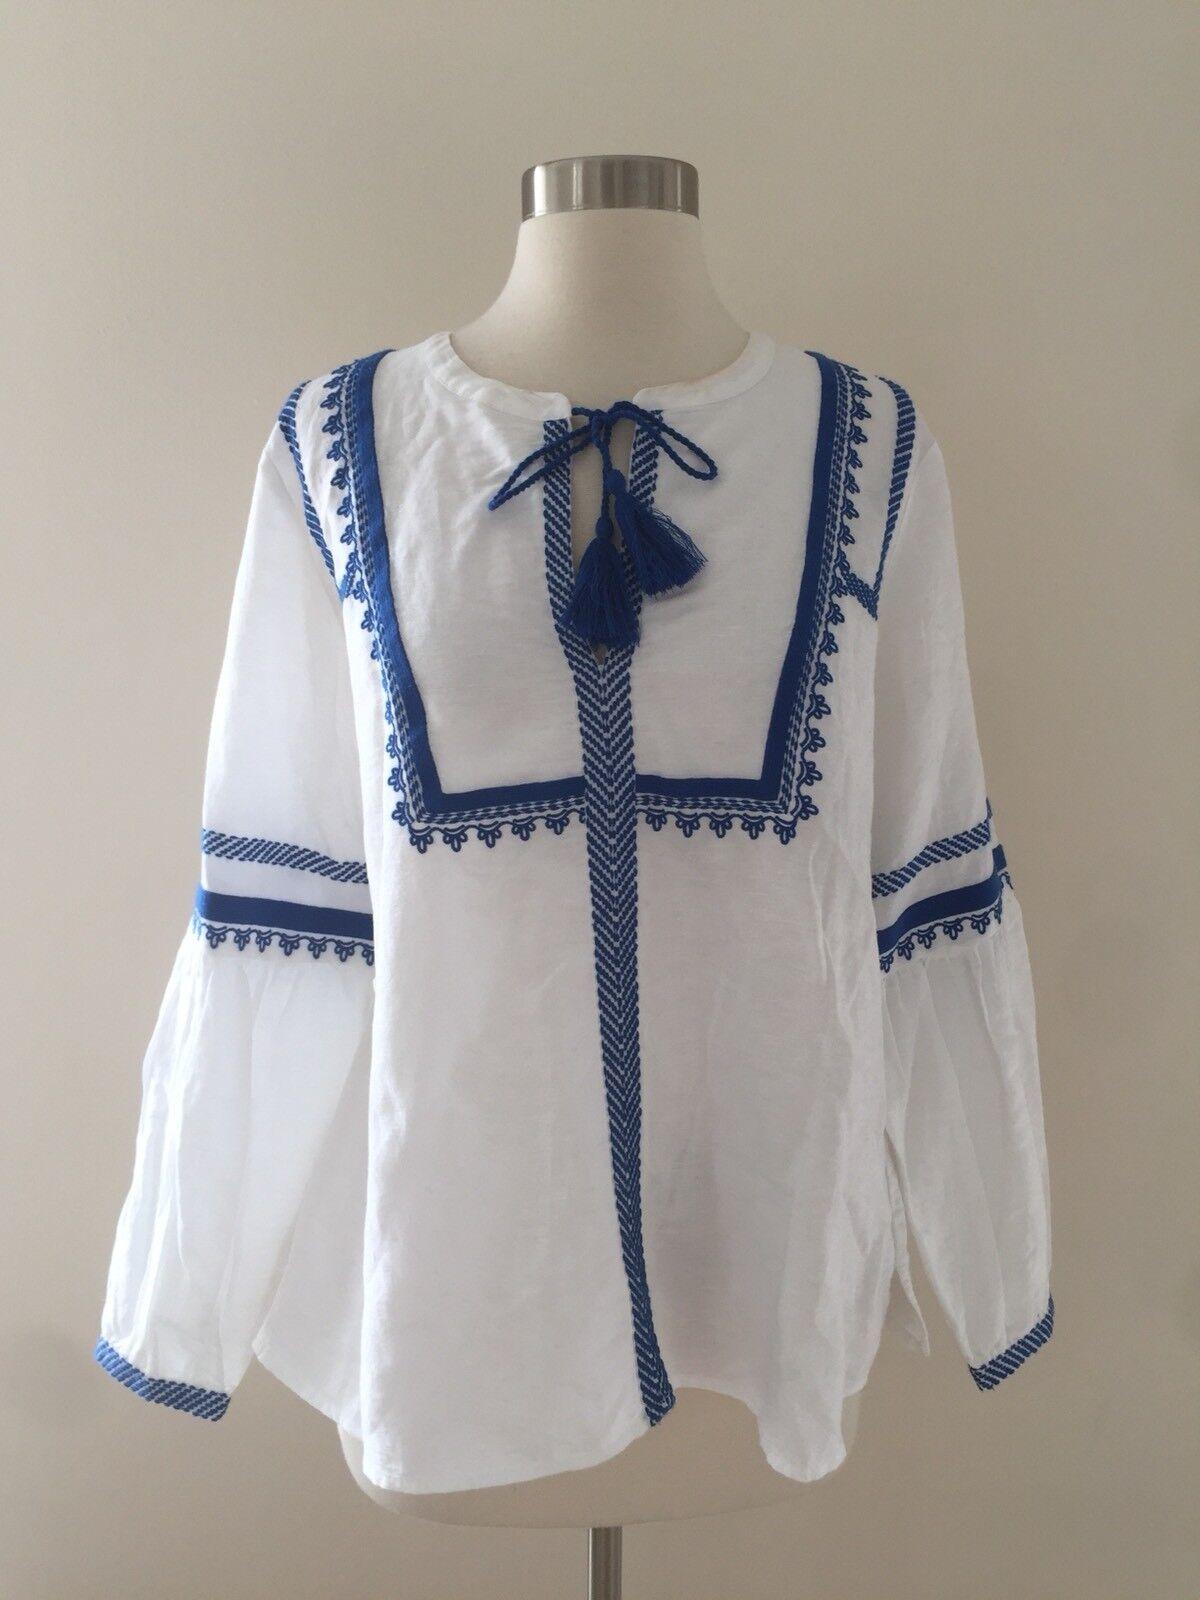 J.Crew Embroiderot linen-cotton top Blouse Weiß Blau Sz 12 G5461